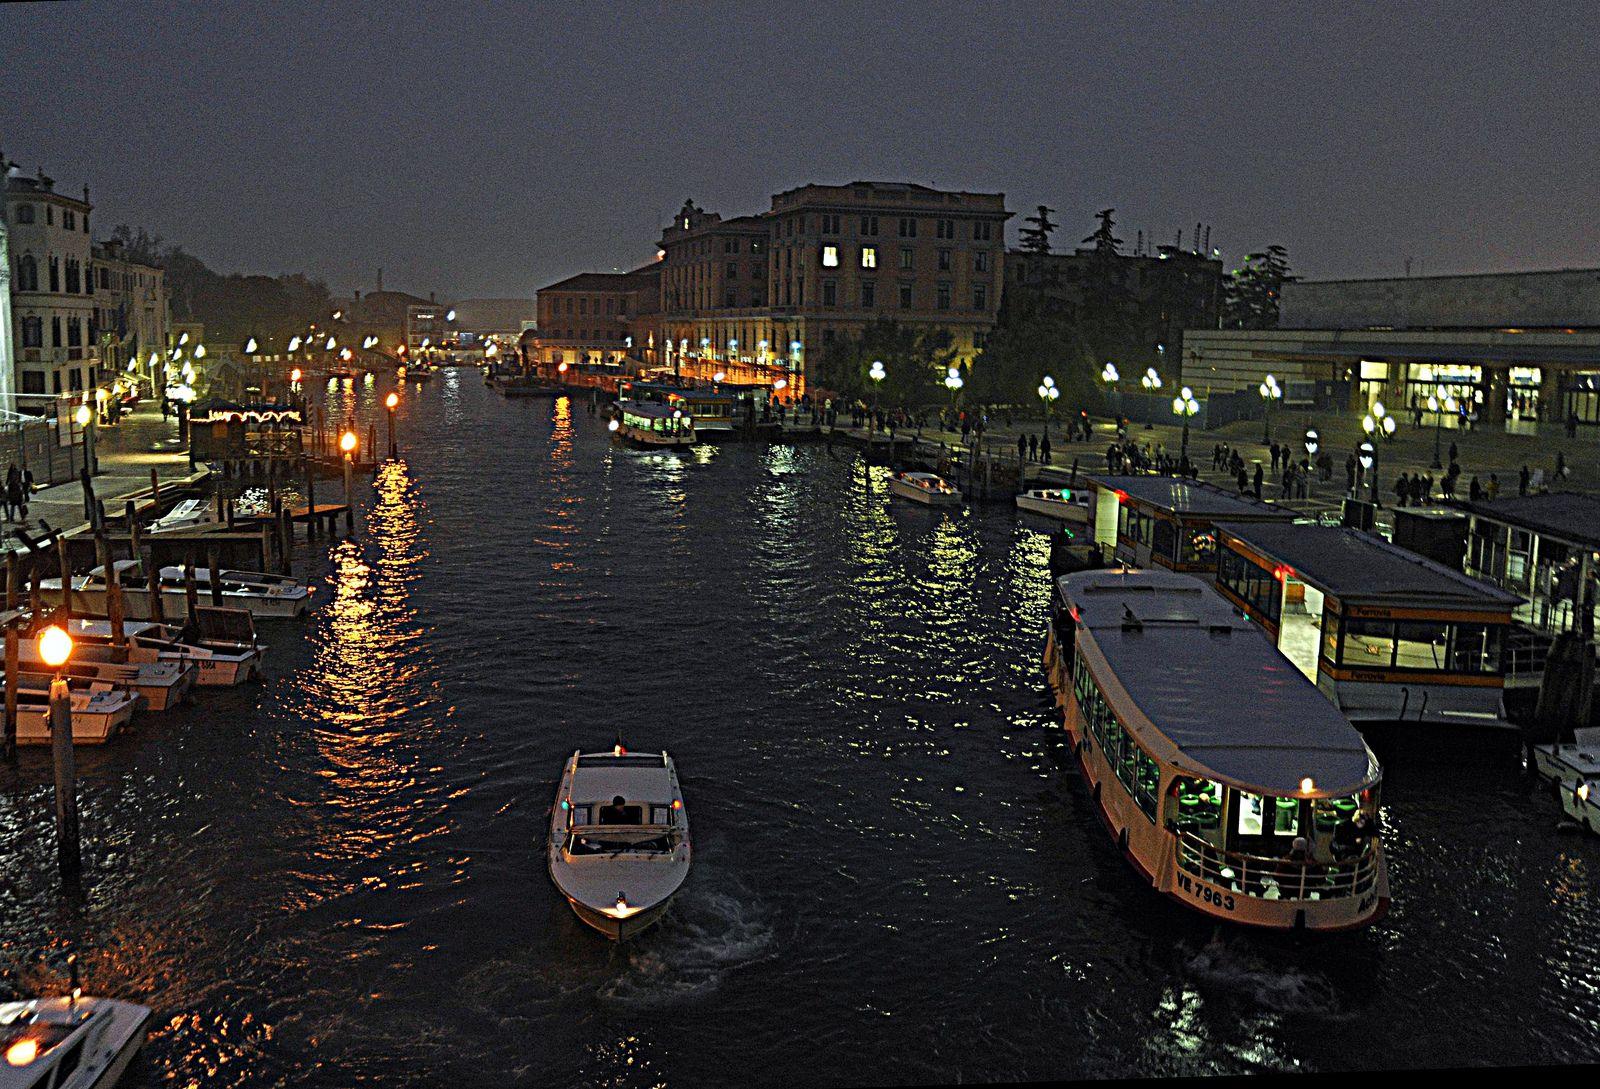 venezia di notte-stazione